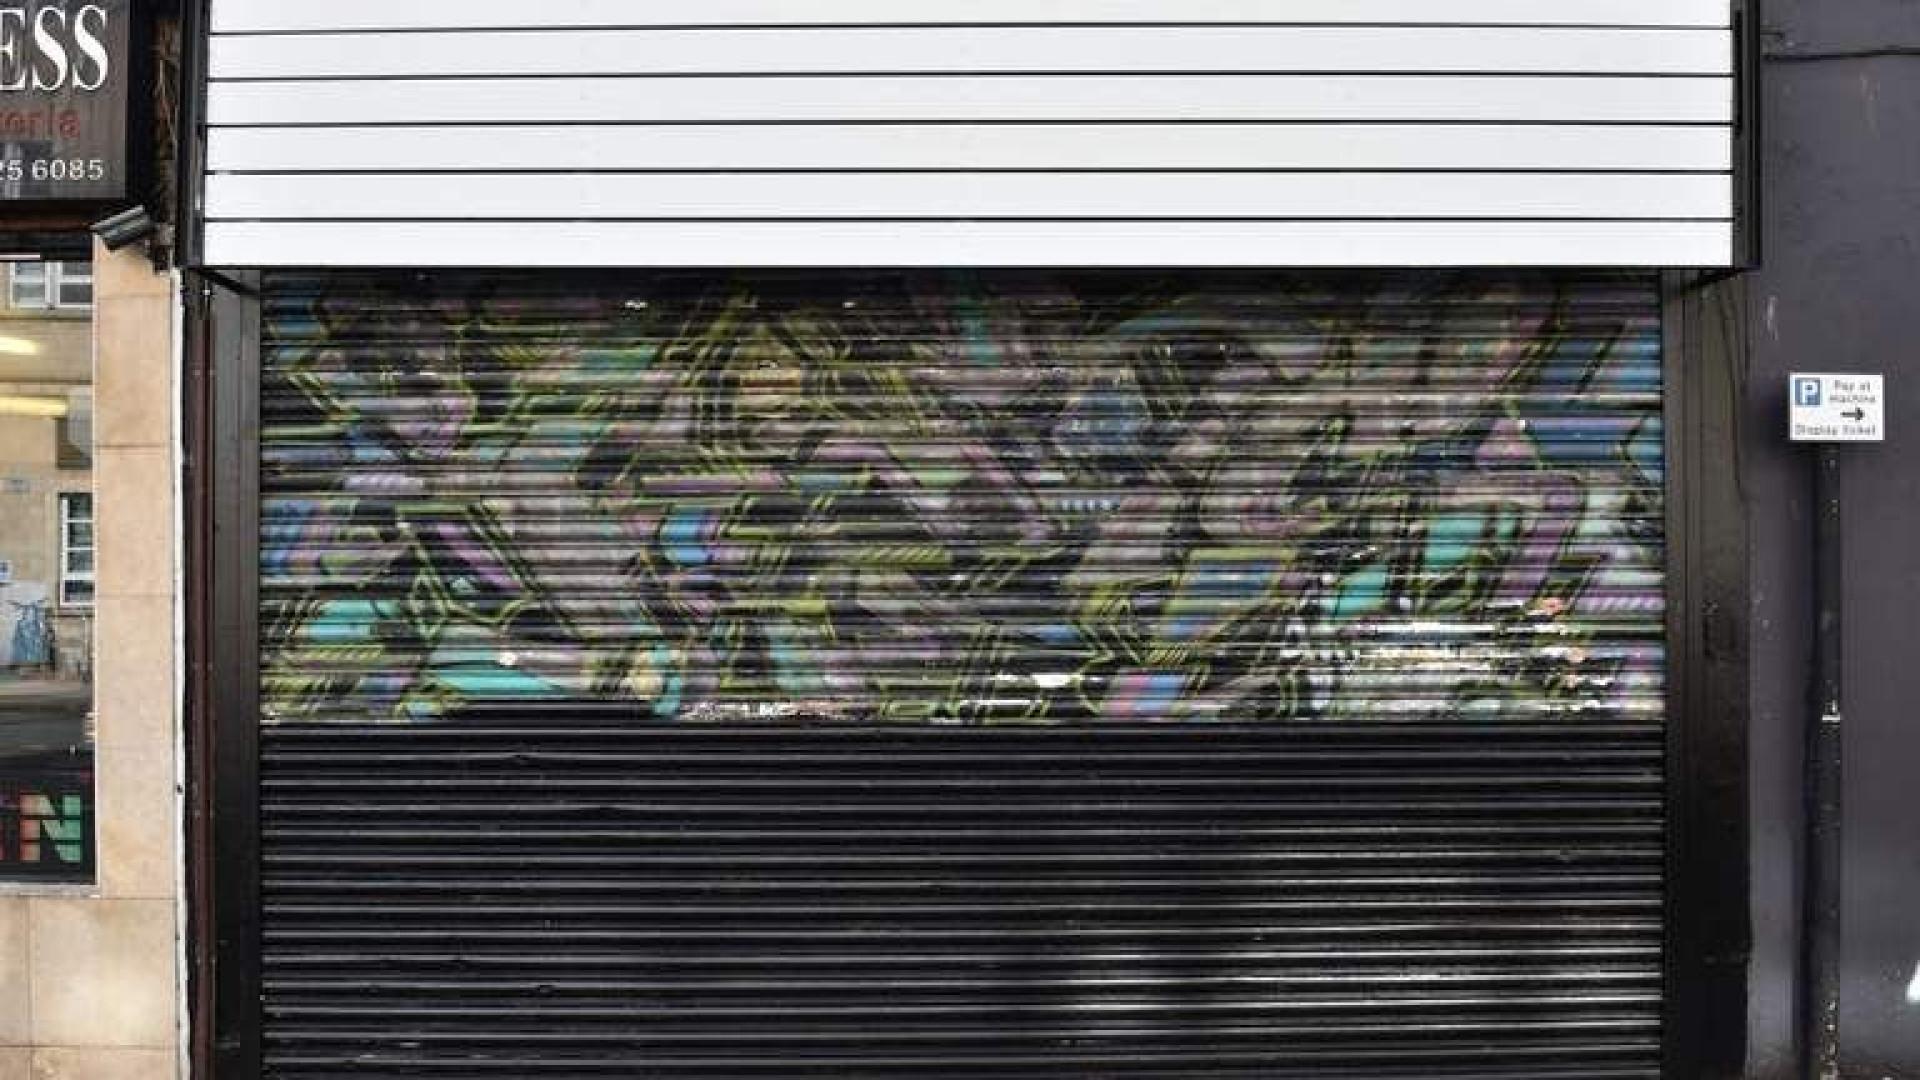 Mural de Banksy pintado por cima por acidente no Reino Unido